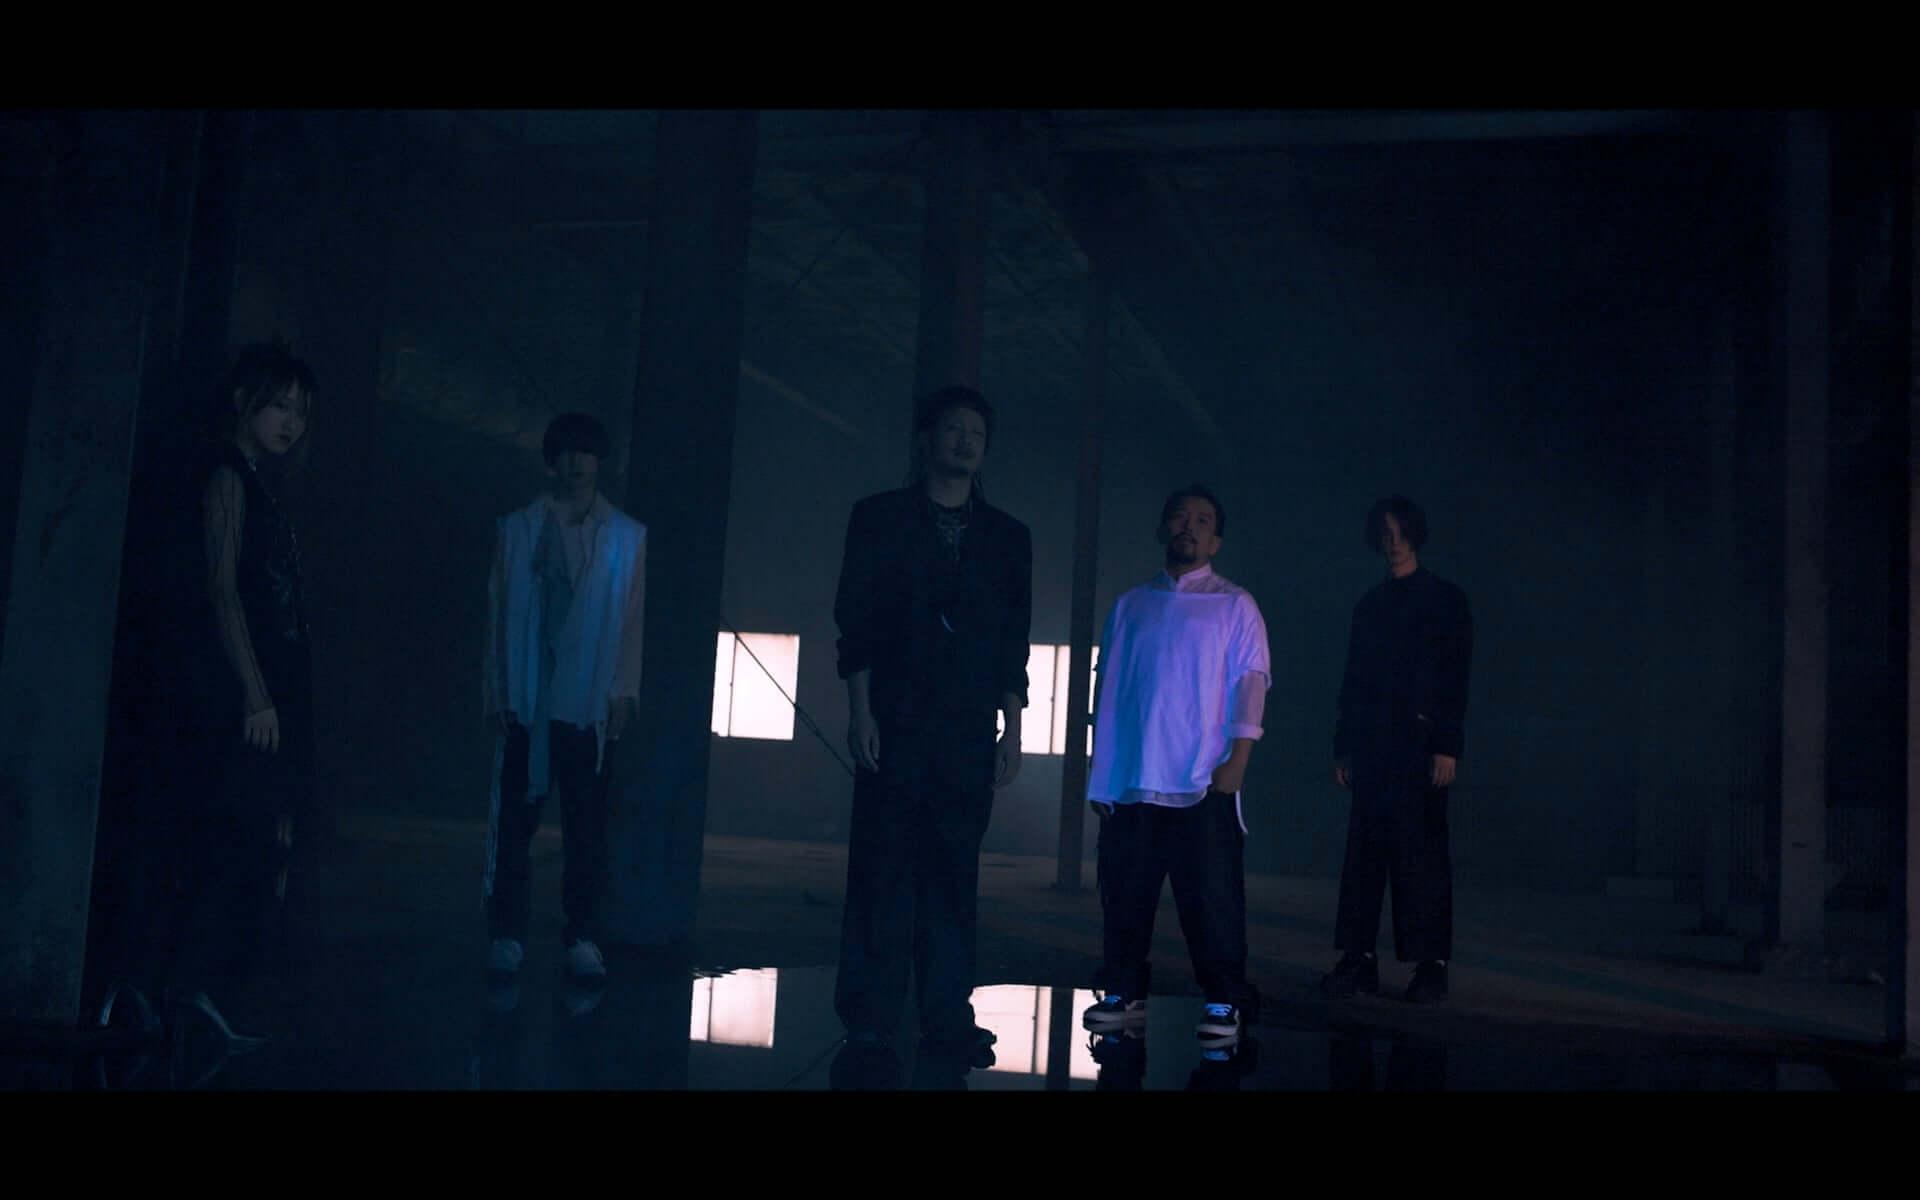 "gatoの最新シングル""dada""が配信開始&MVも公開!バンド初のフルアルバム『BAECUL』もリリース決定 music200903_gato_7-1920x1200"